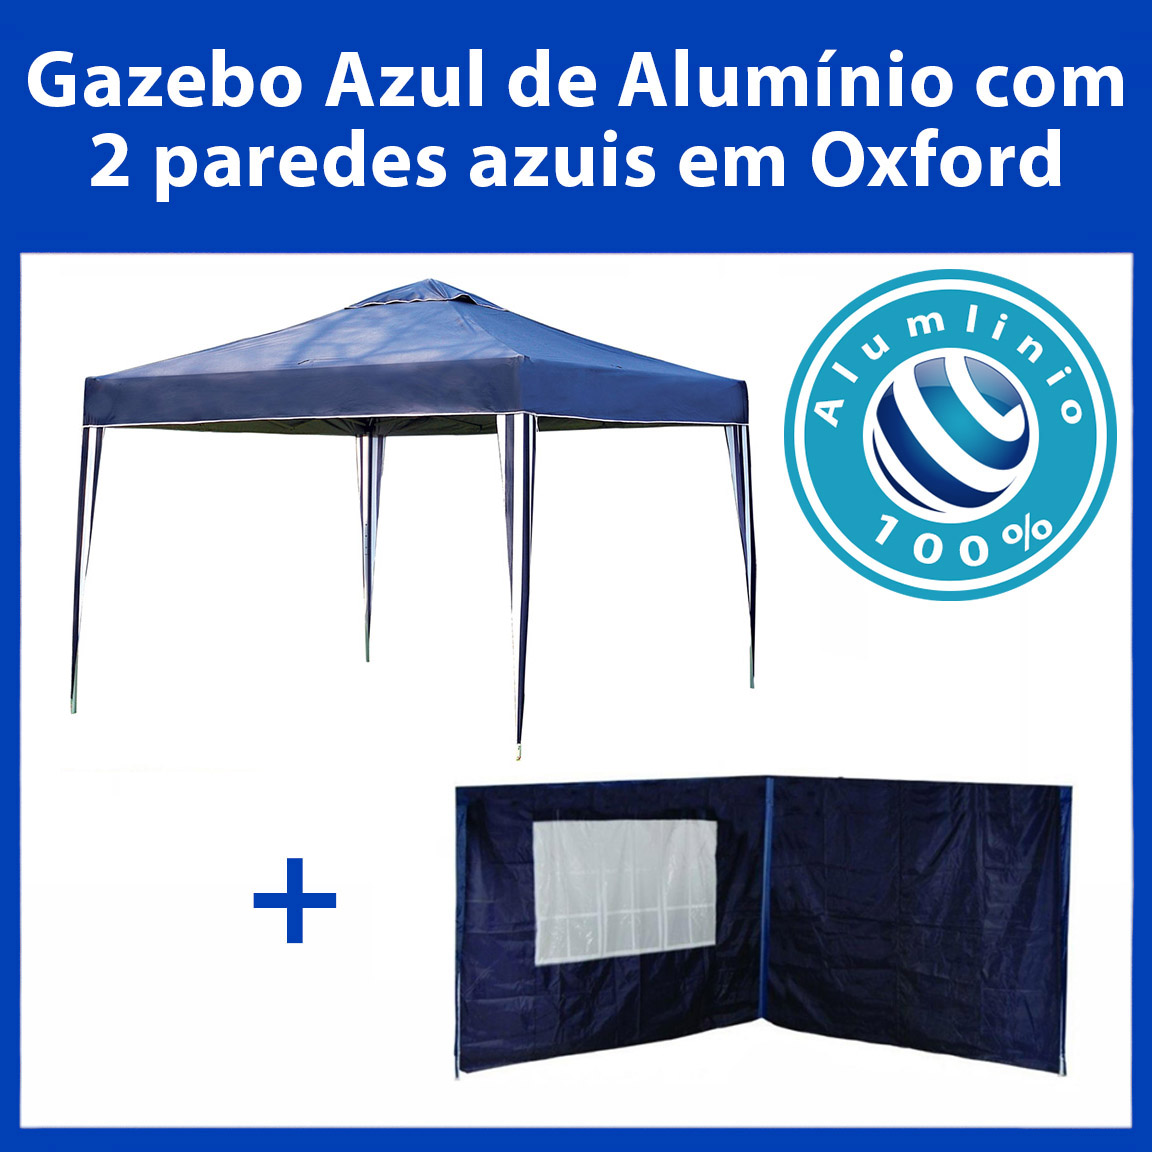 Gazebo 3x3 Articulado 100% Alumínio + 2 Paredes Azuis de Oxford Eleva Mundi - Azul